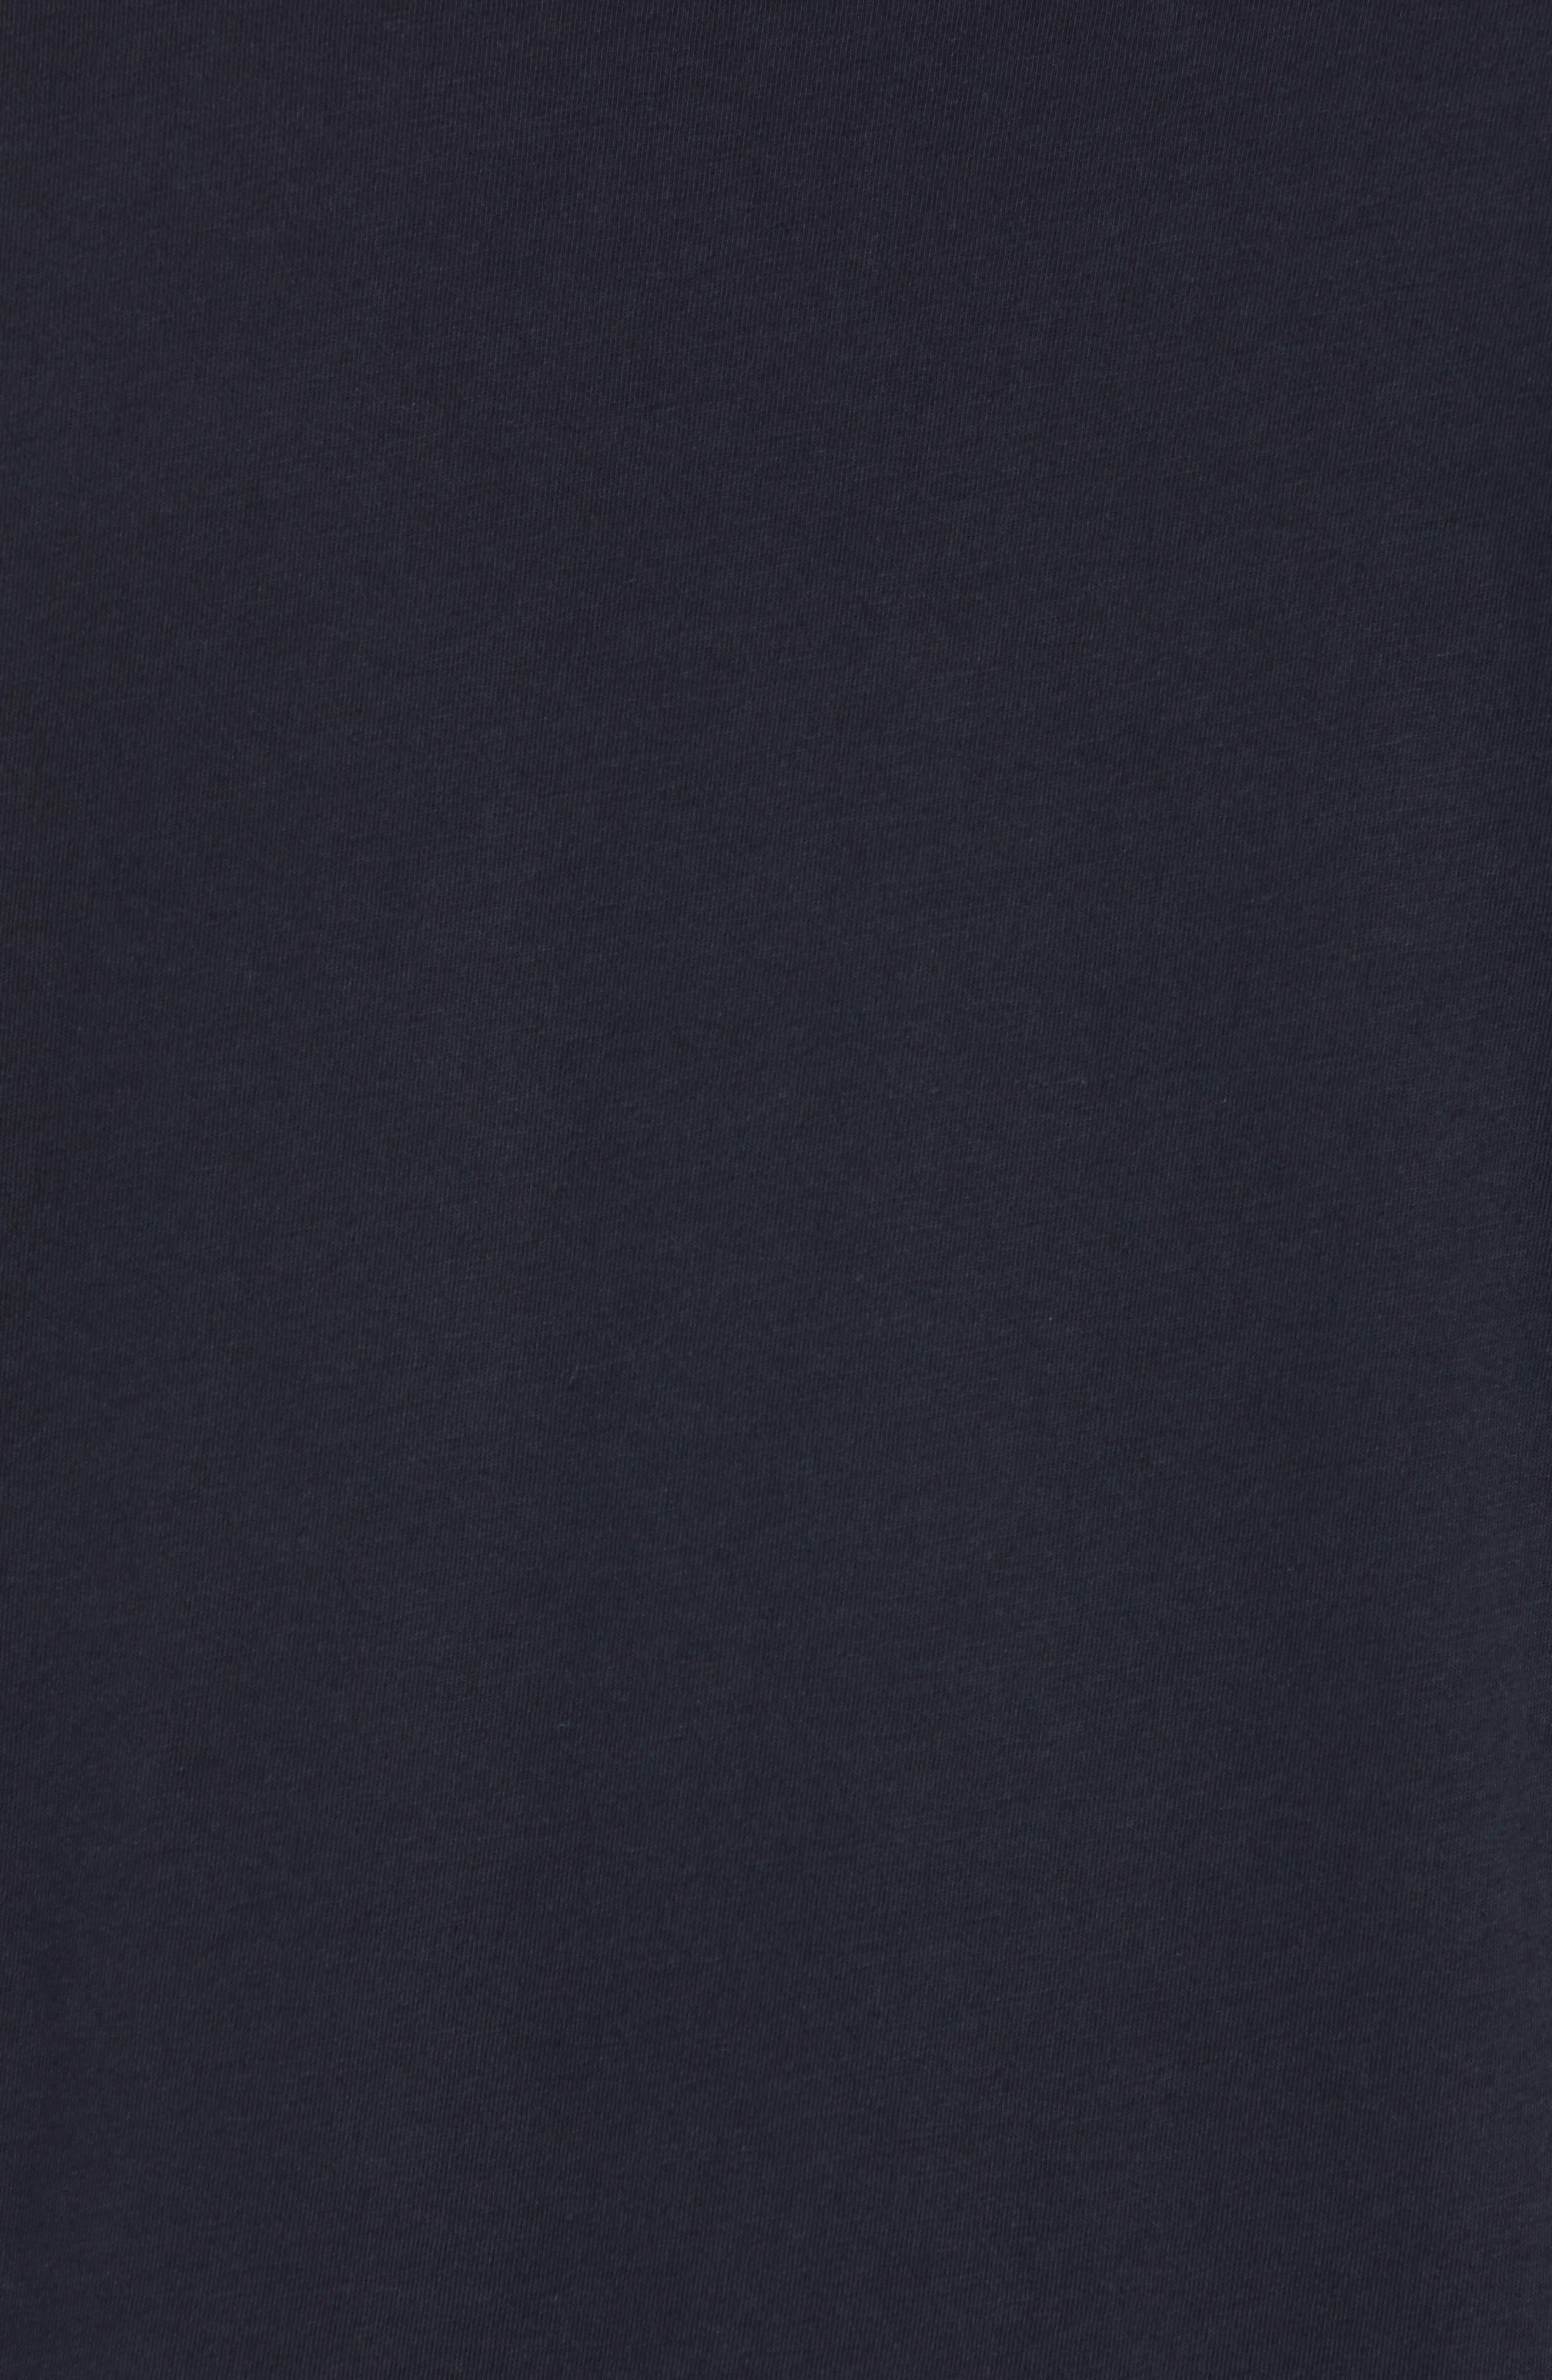 Rock City Crewneck T-Shirt,                             Alternate thumbnail 5, color,                             BLACK